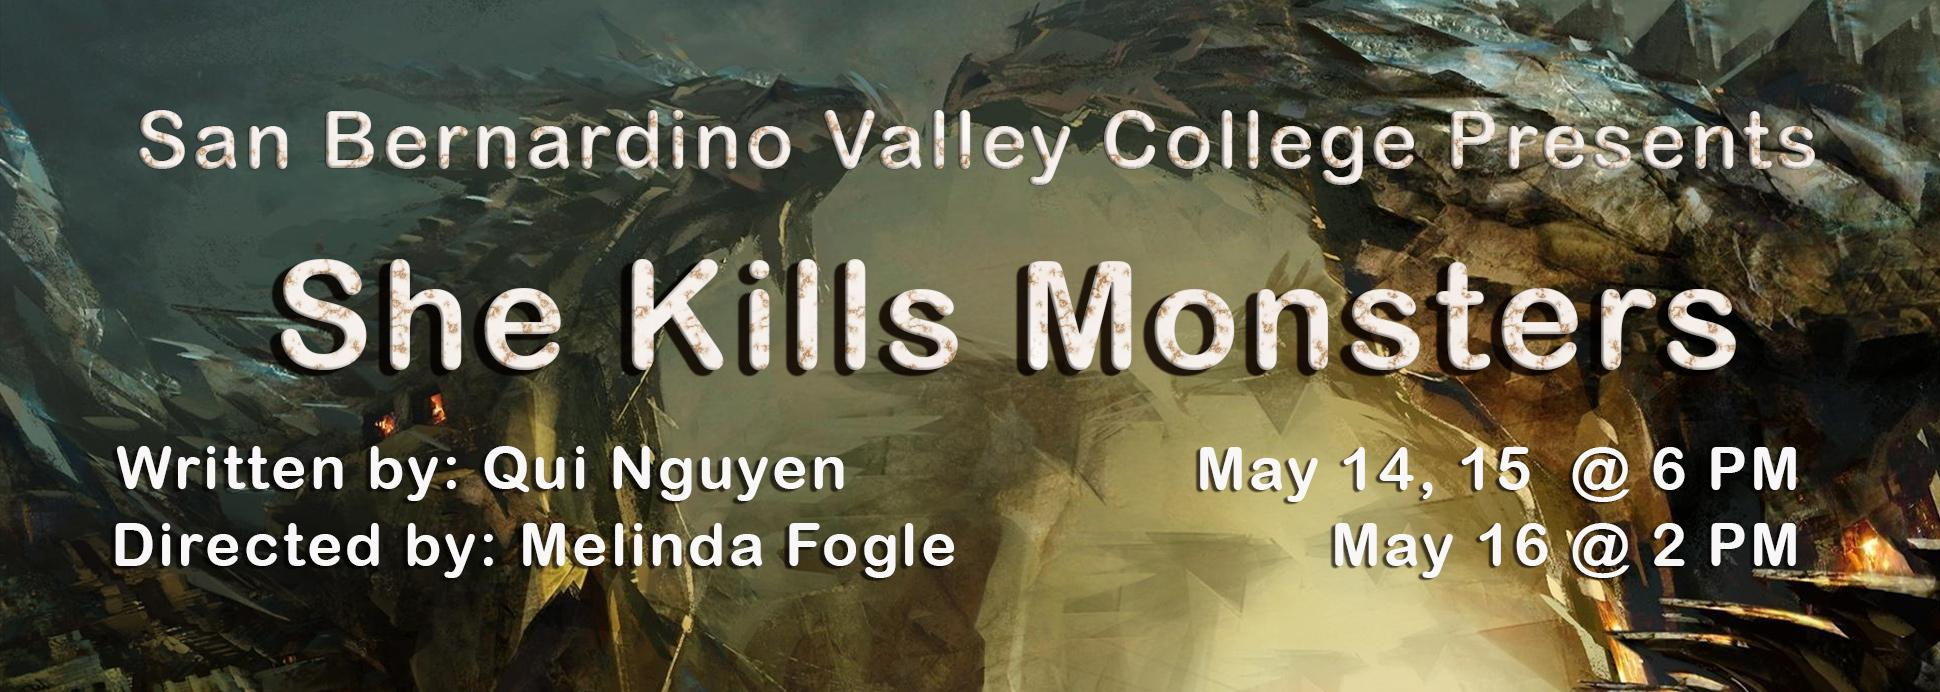 "SBVC Theatre Arts Department Presents ""She Kills Monsters"""